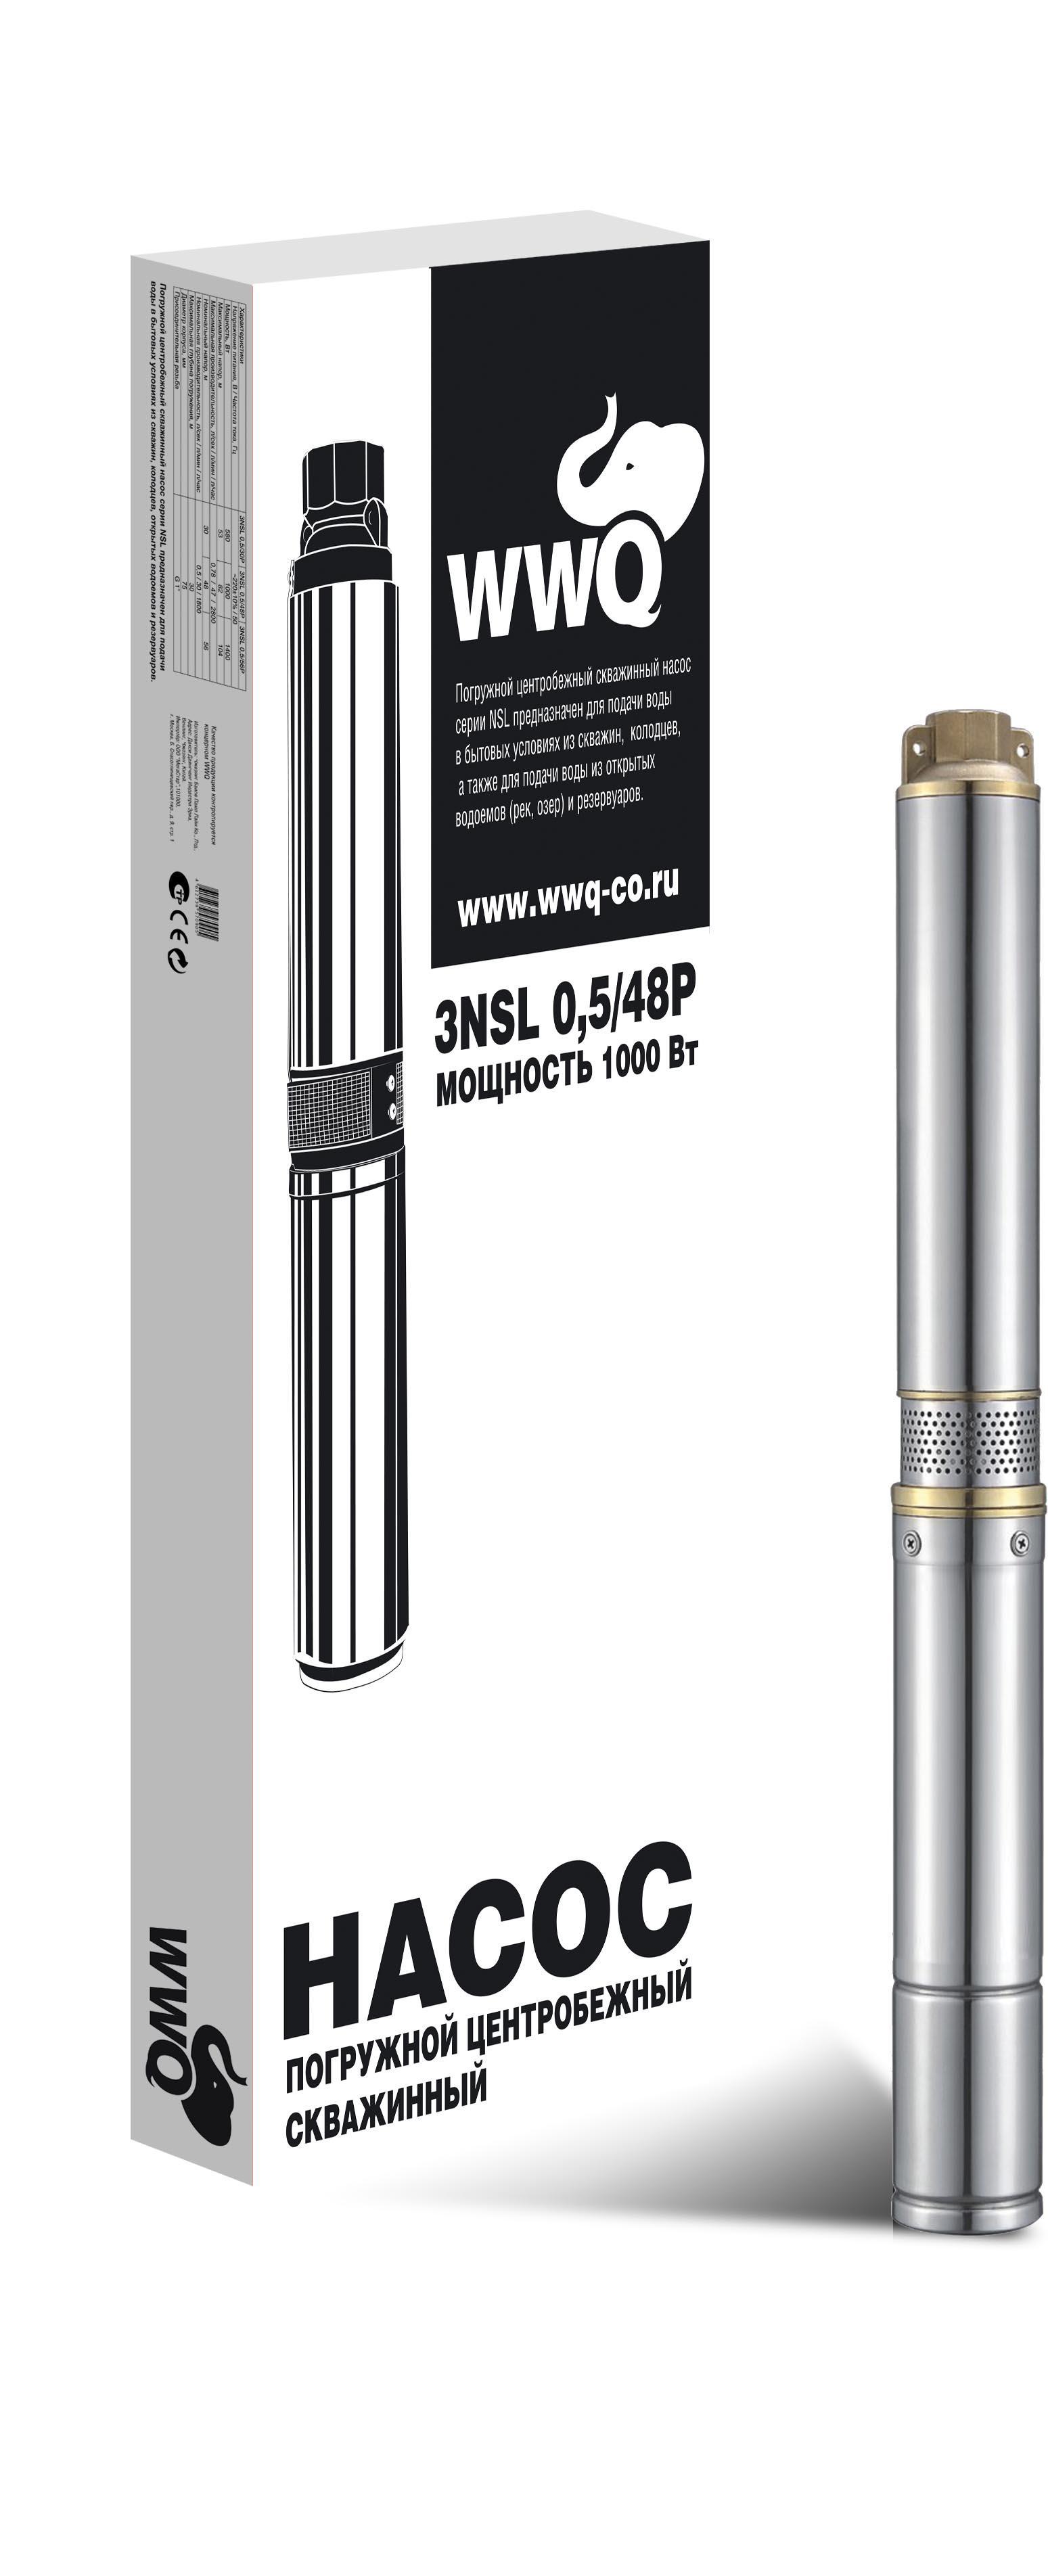 Центробежный насос Wwq 3nsl 0.5/48Р